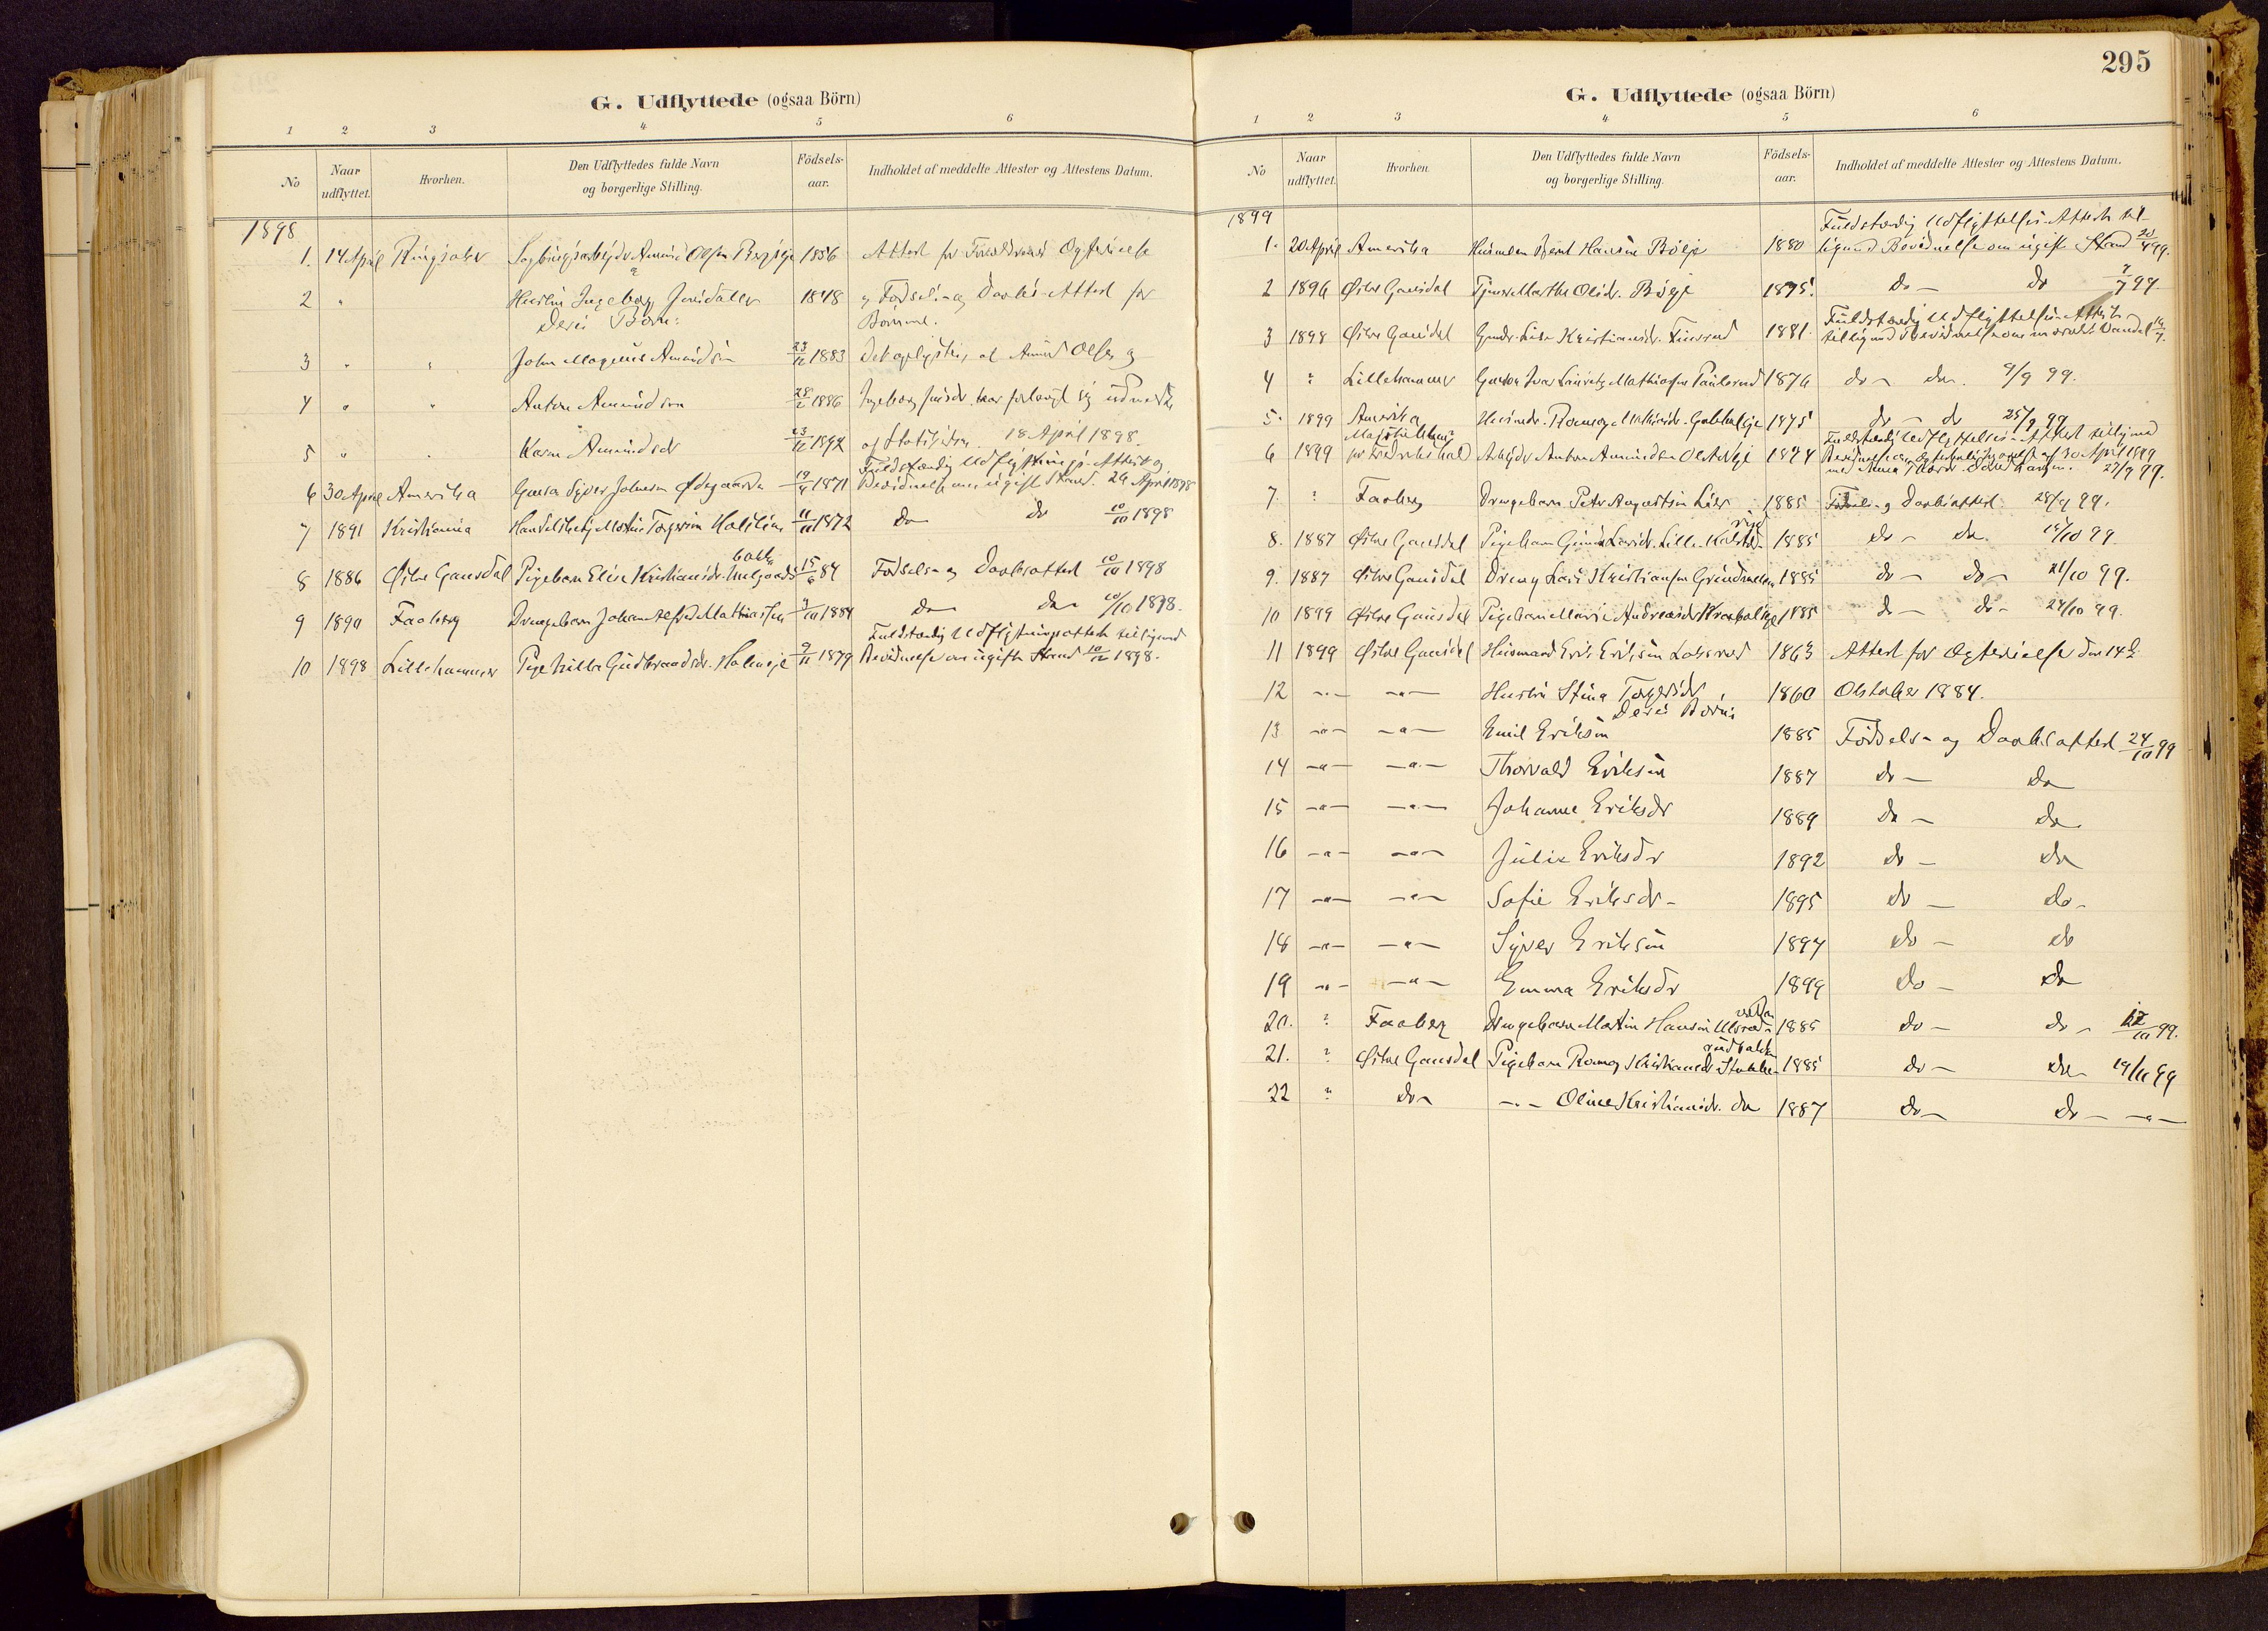 SAH, Vestre Gausdal prestekontor, Ministerialbok nr. 1, 1887-1914, s. 295